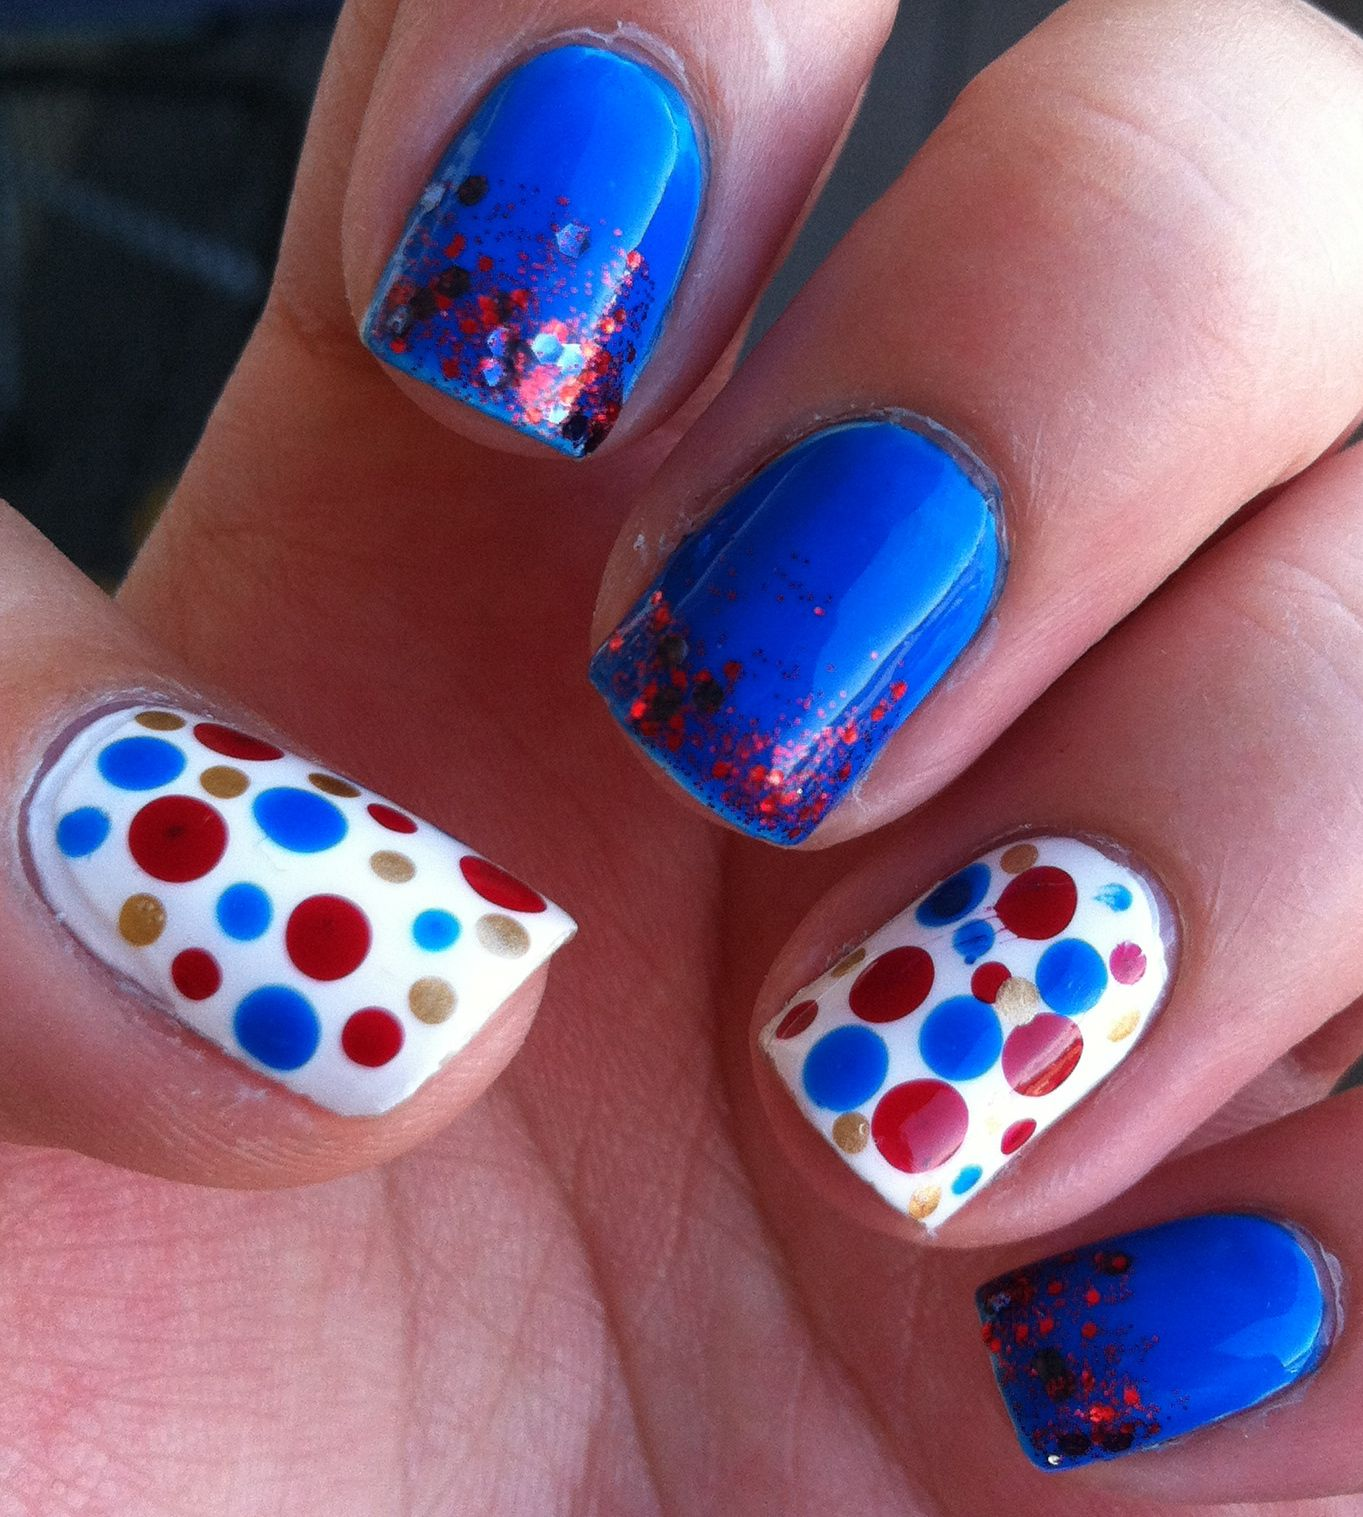 MissJenFABULOUS Nails | ... Diy Nail Art Designs Blue Two Tone Nails ...